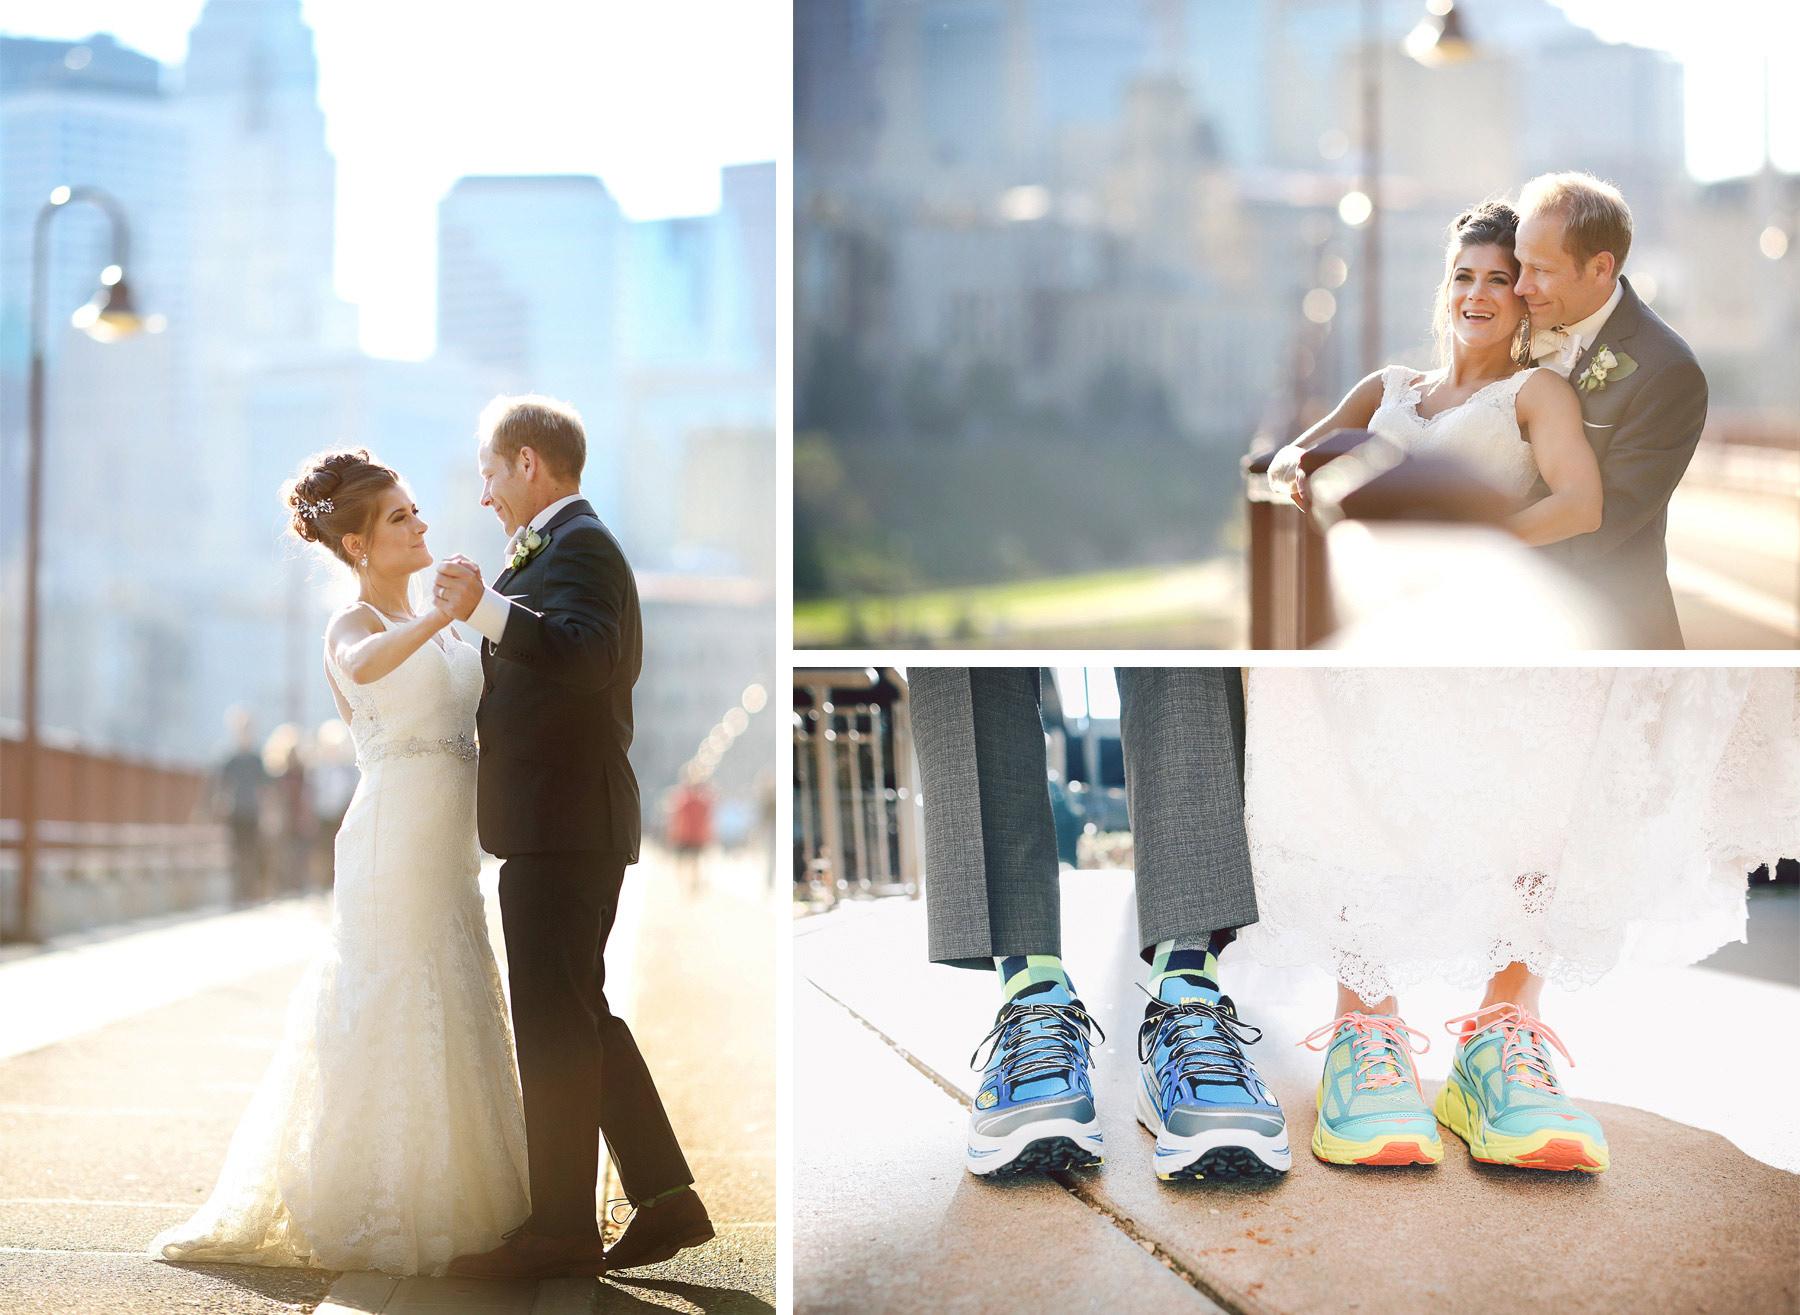 16-Minneapolis-Minnesota-Wedding-Photographer-by-Andrew-Vick-Photography-Fall-Autumn-Bride-Groom-Stone-Arch-Bridge-Dance-Embrace-Running-Shoes-Vintage-Paula-and-Jason.jpg